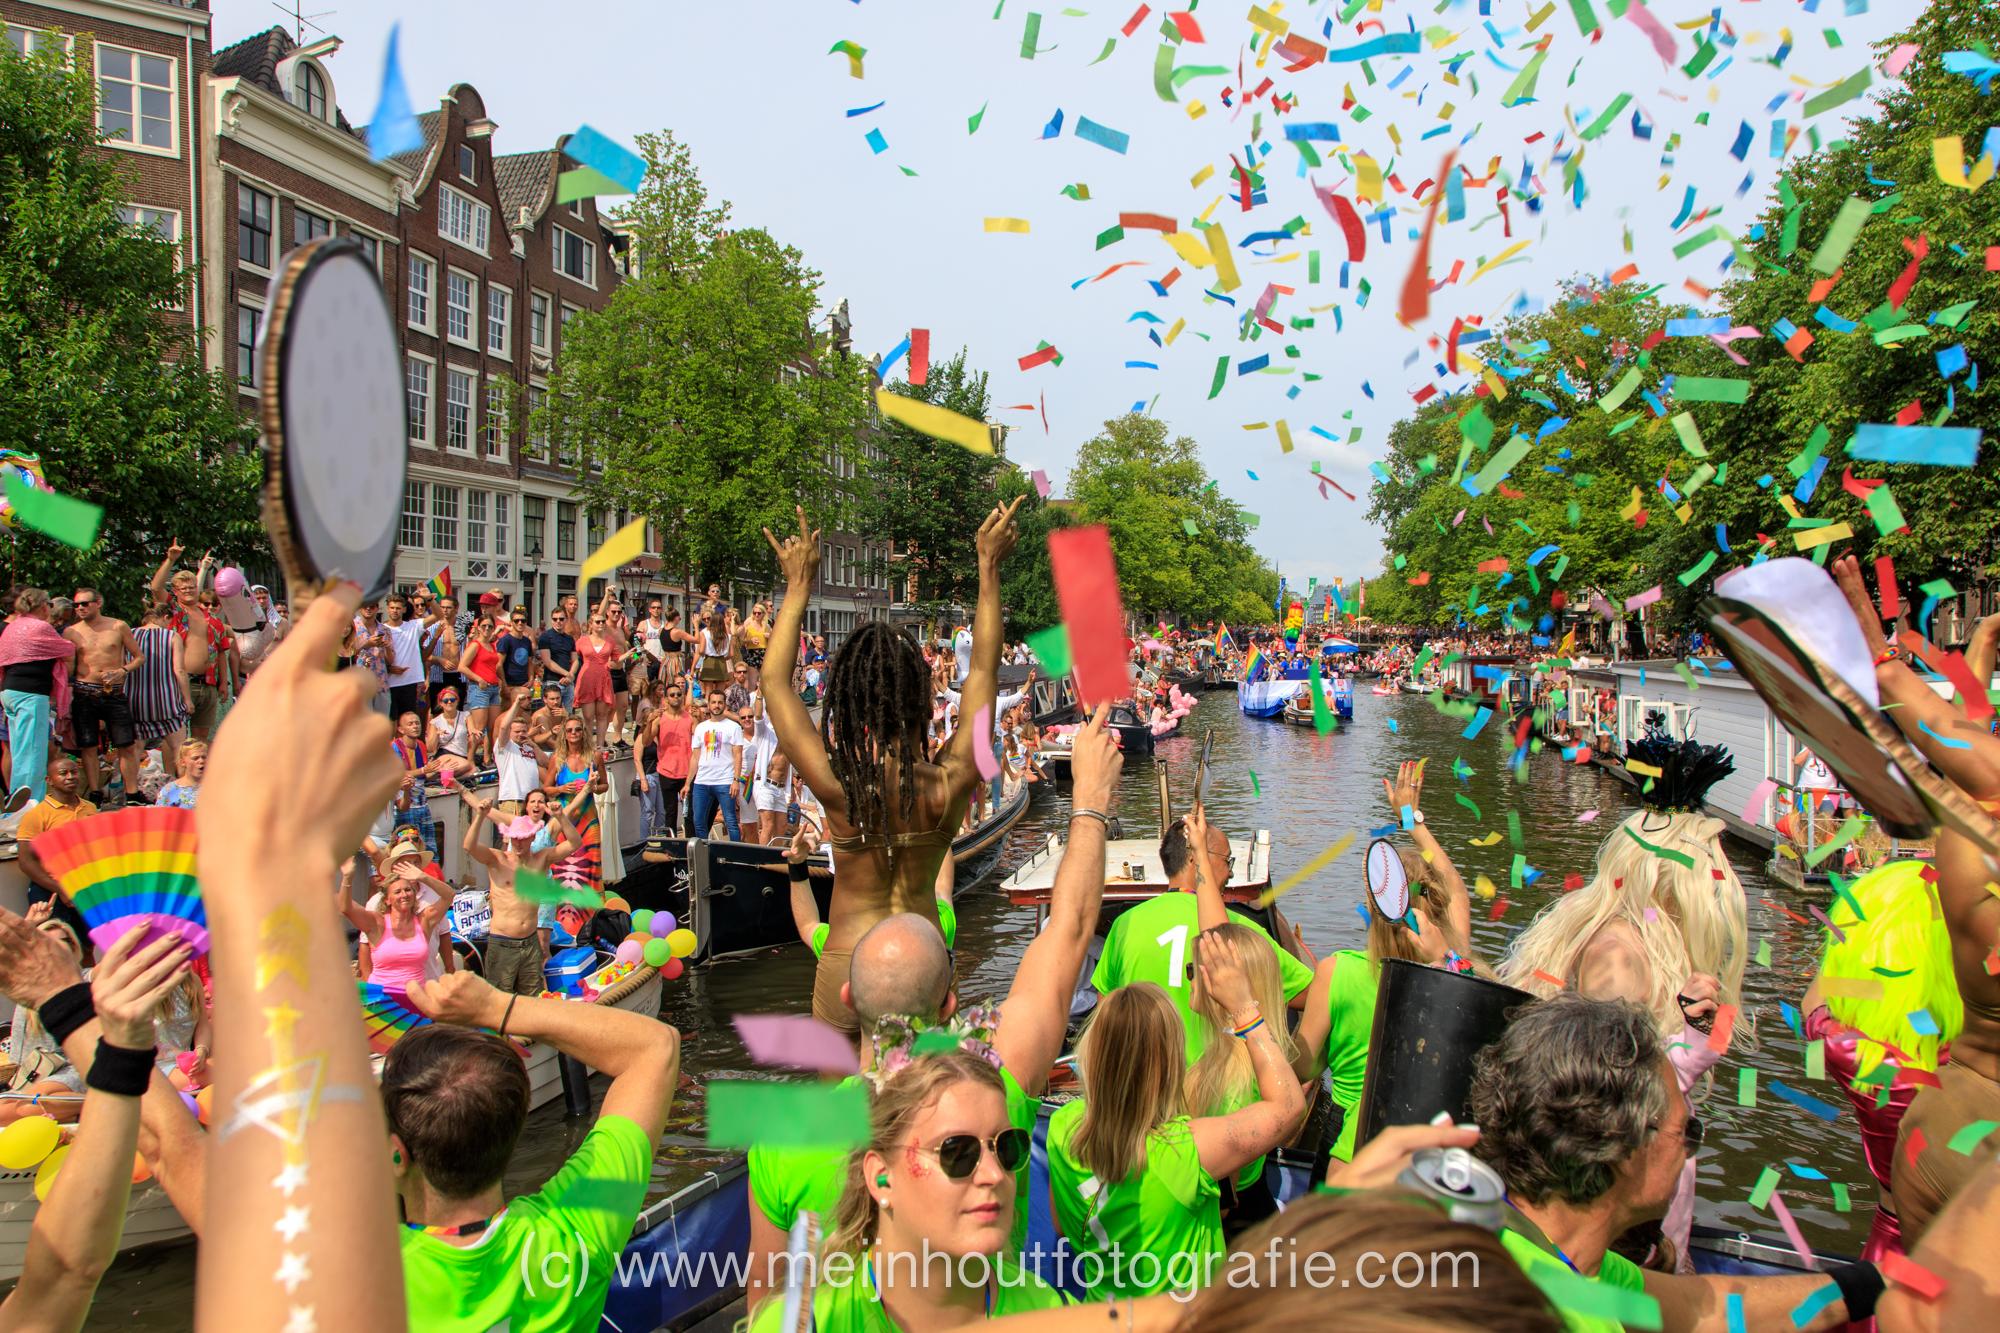 20180804-_MG_0466 Deloitte Gay Pride 2018.jpg